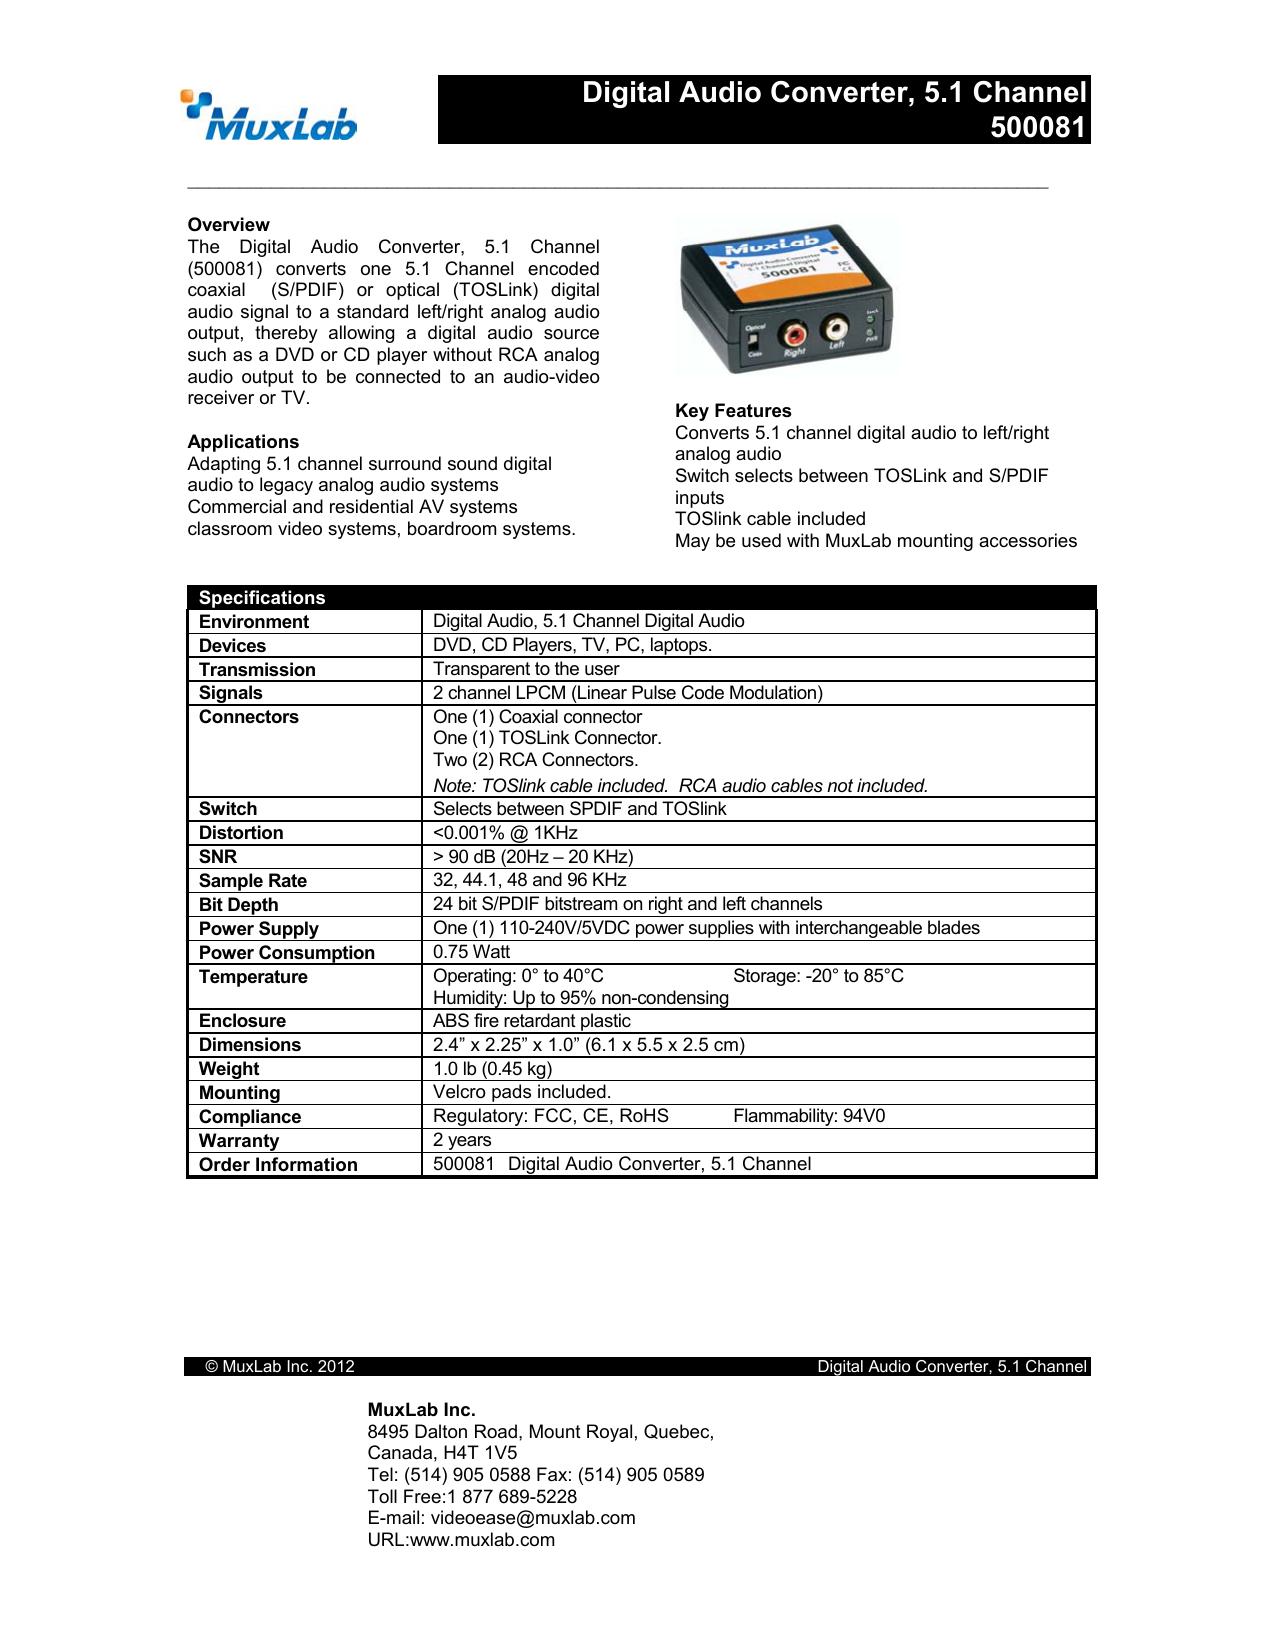 Digital Audio Converter, 5 1 Channel 500081   manualzz com